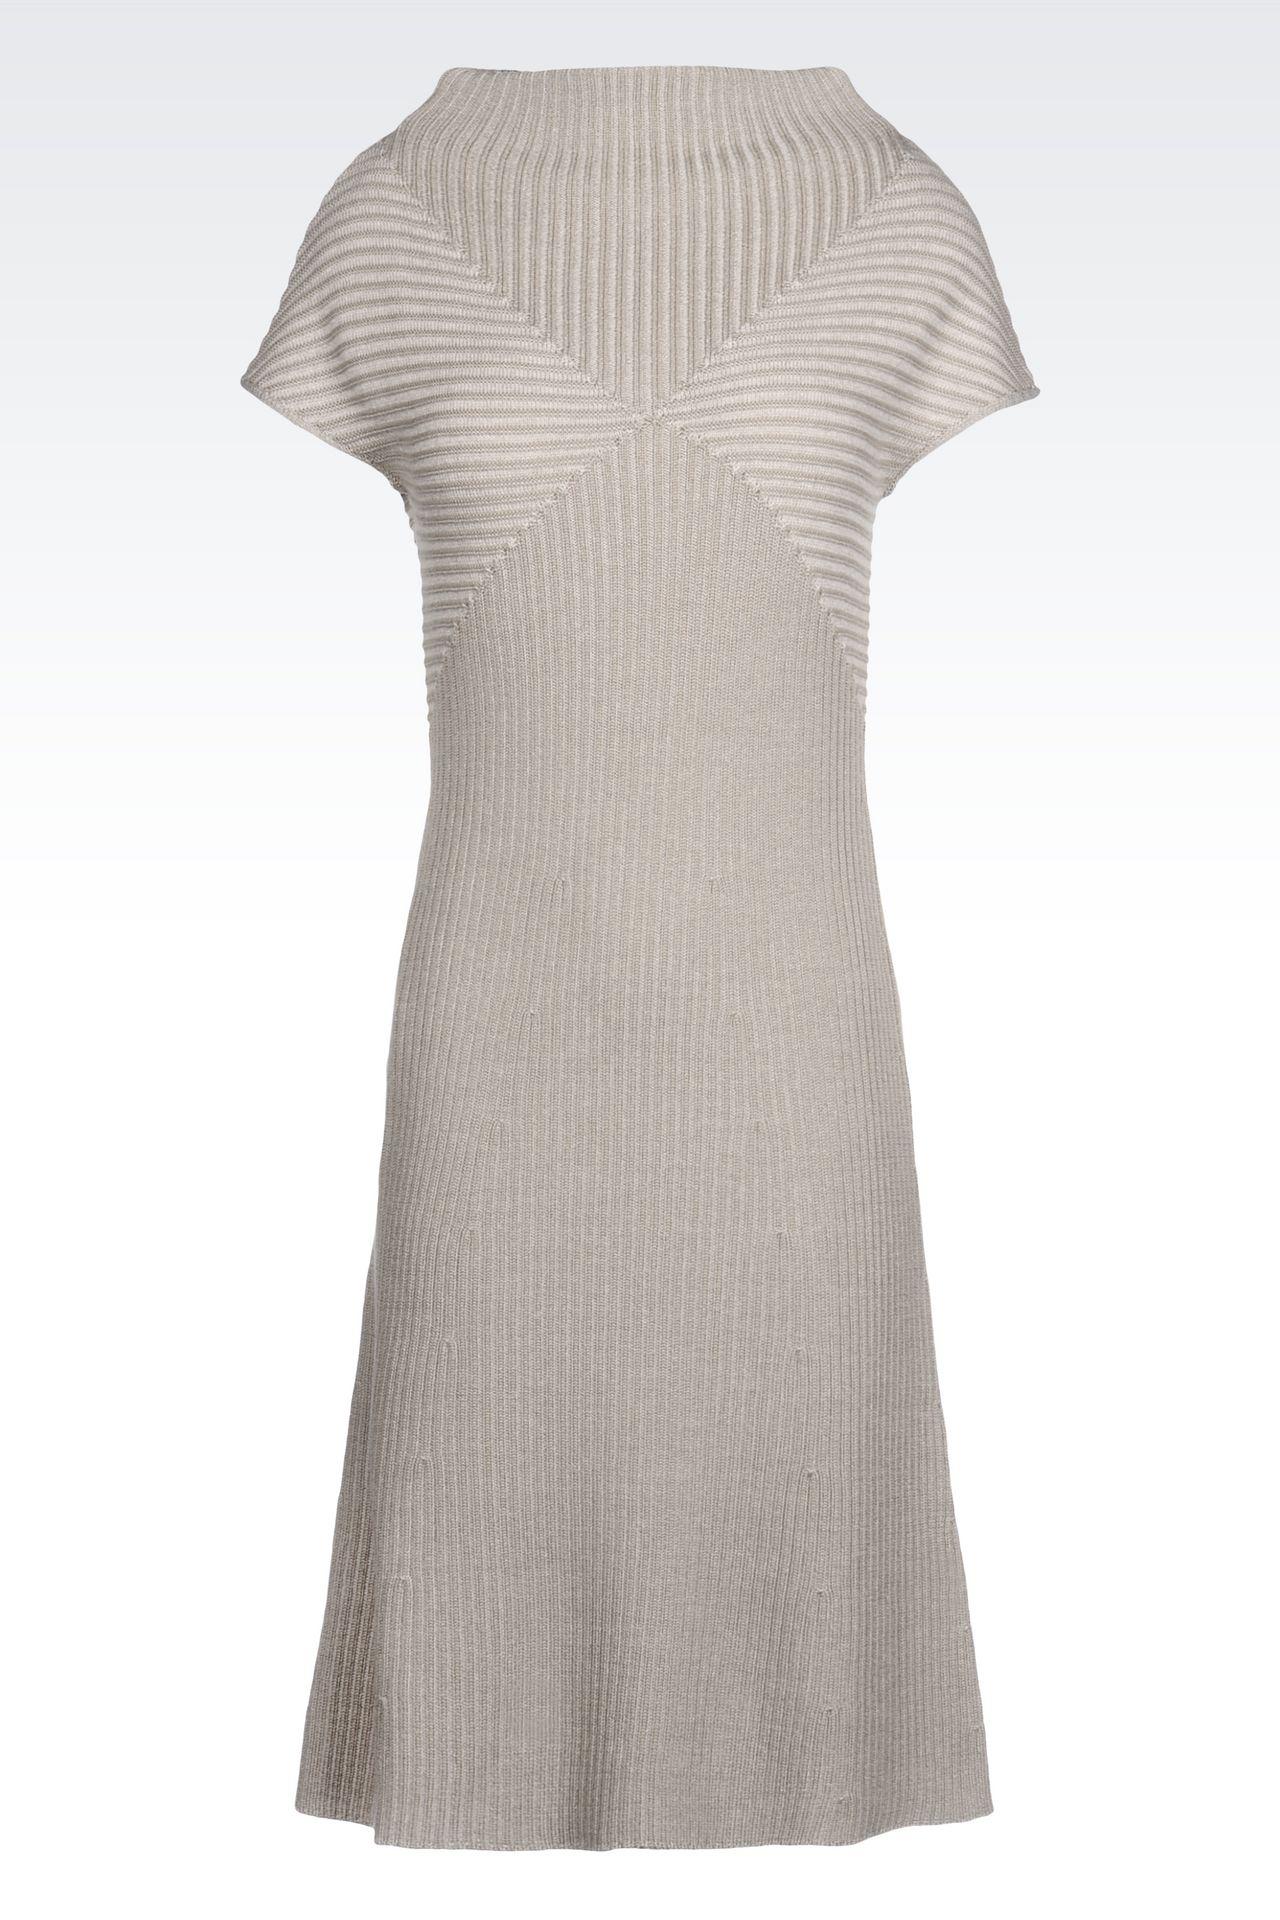 DRESS IN RIBBED VIRGIN WOOL: Short Dresses Women by Armani - 0